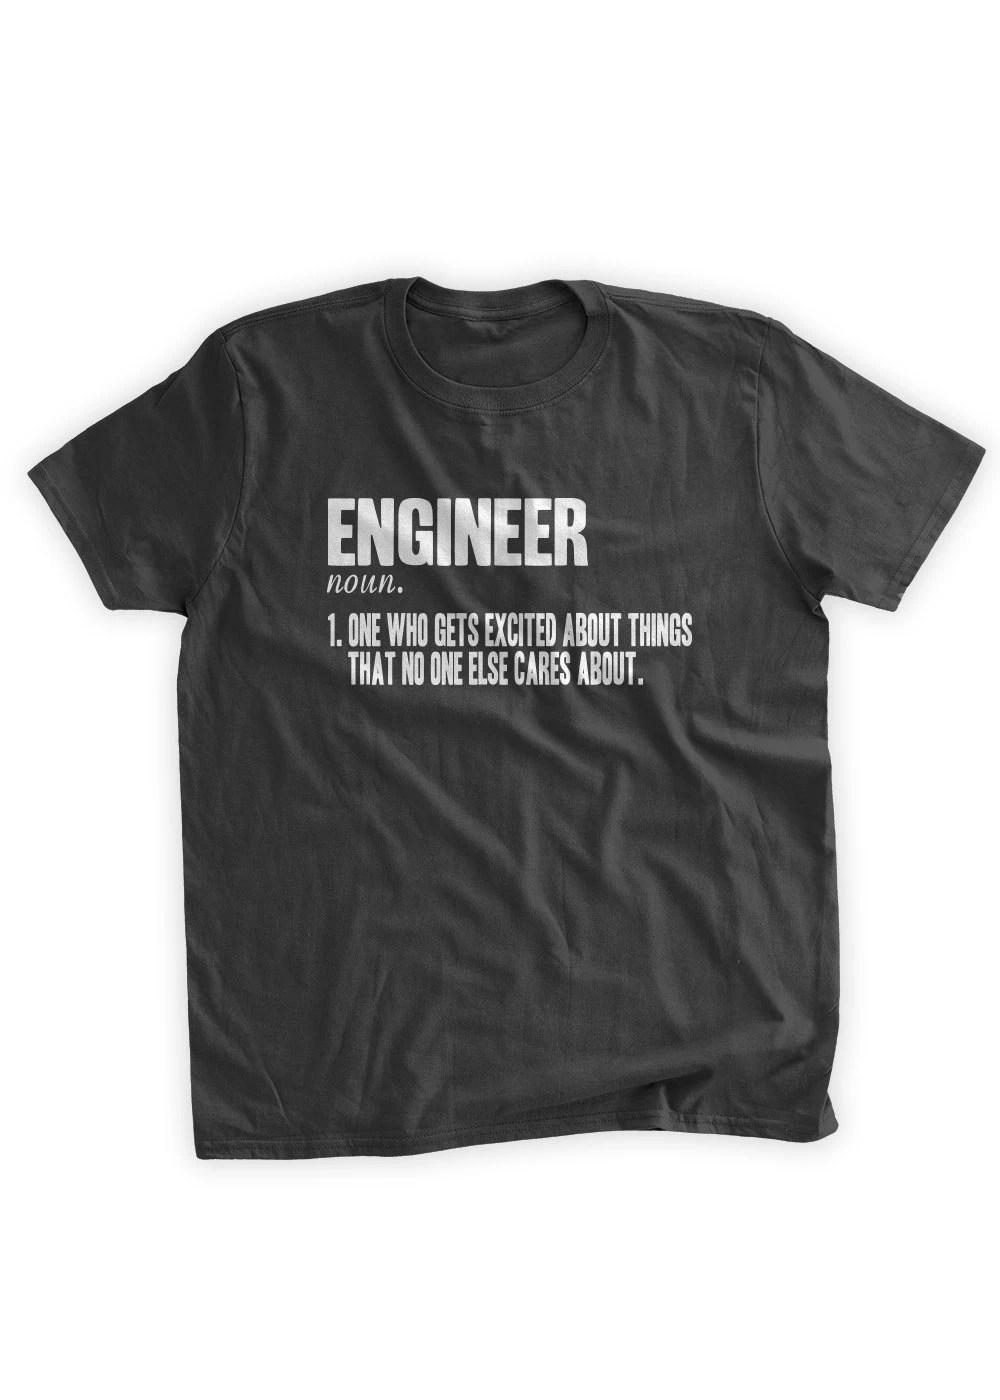 Keep Well Lubricated Sleep With A Mechanic T Shirt Funny Gifts